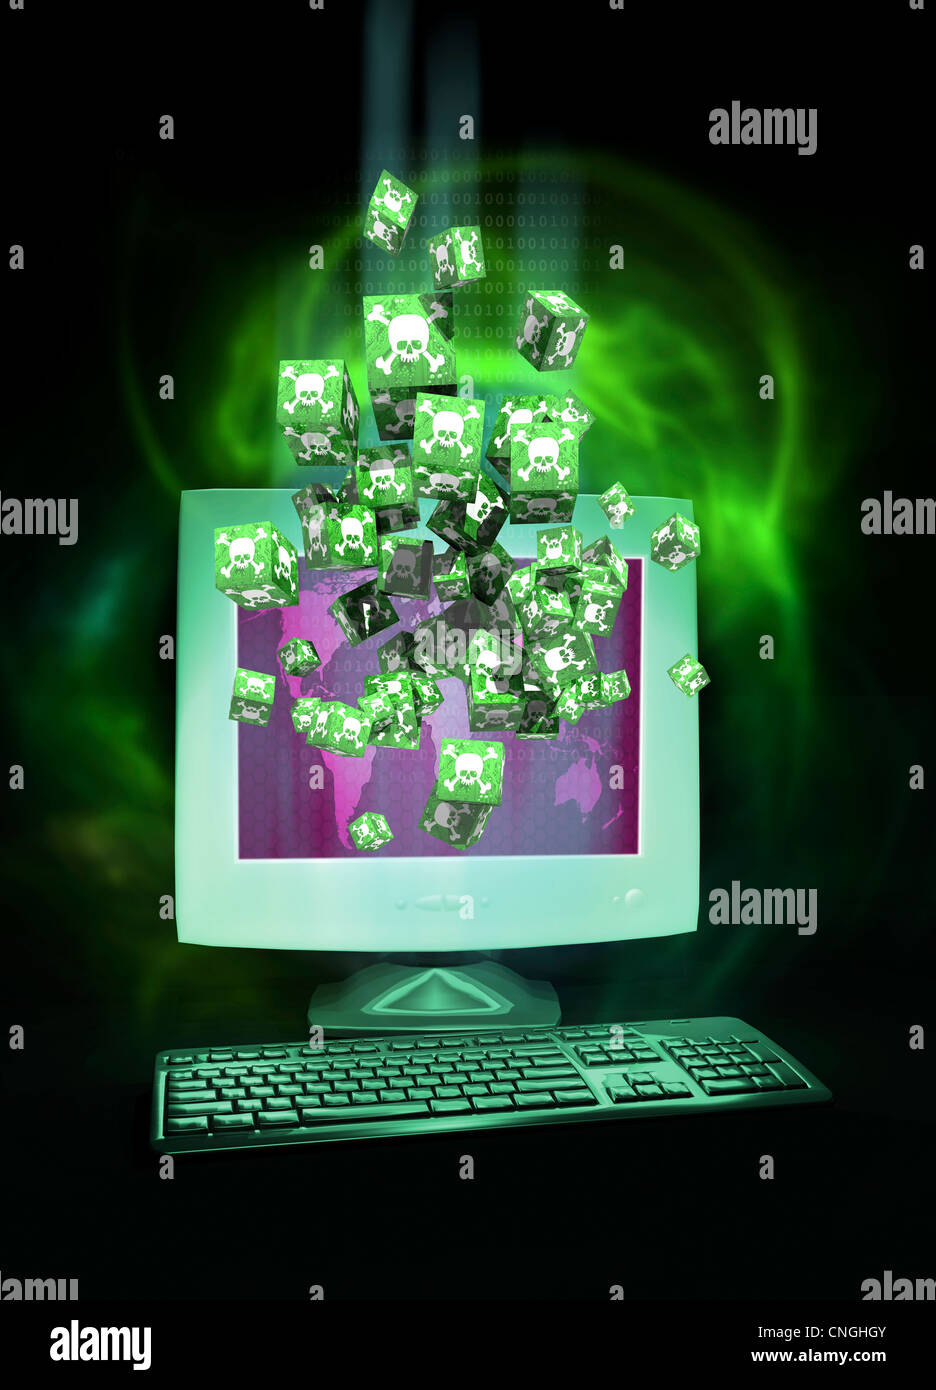 Digital piracy  conceptual artwork - Stock Image